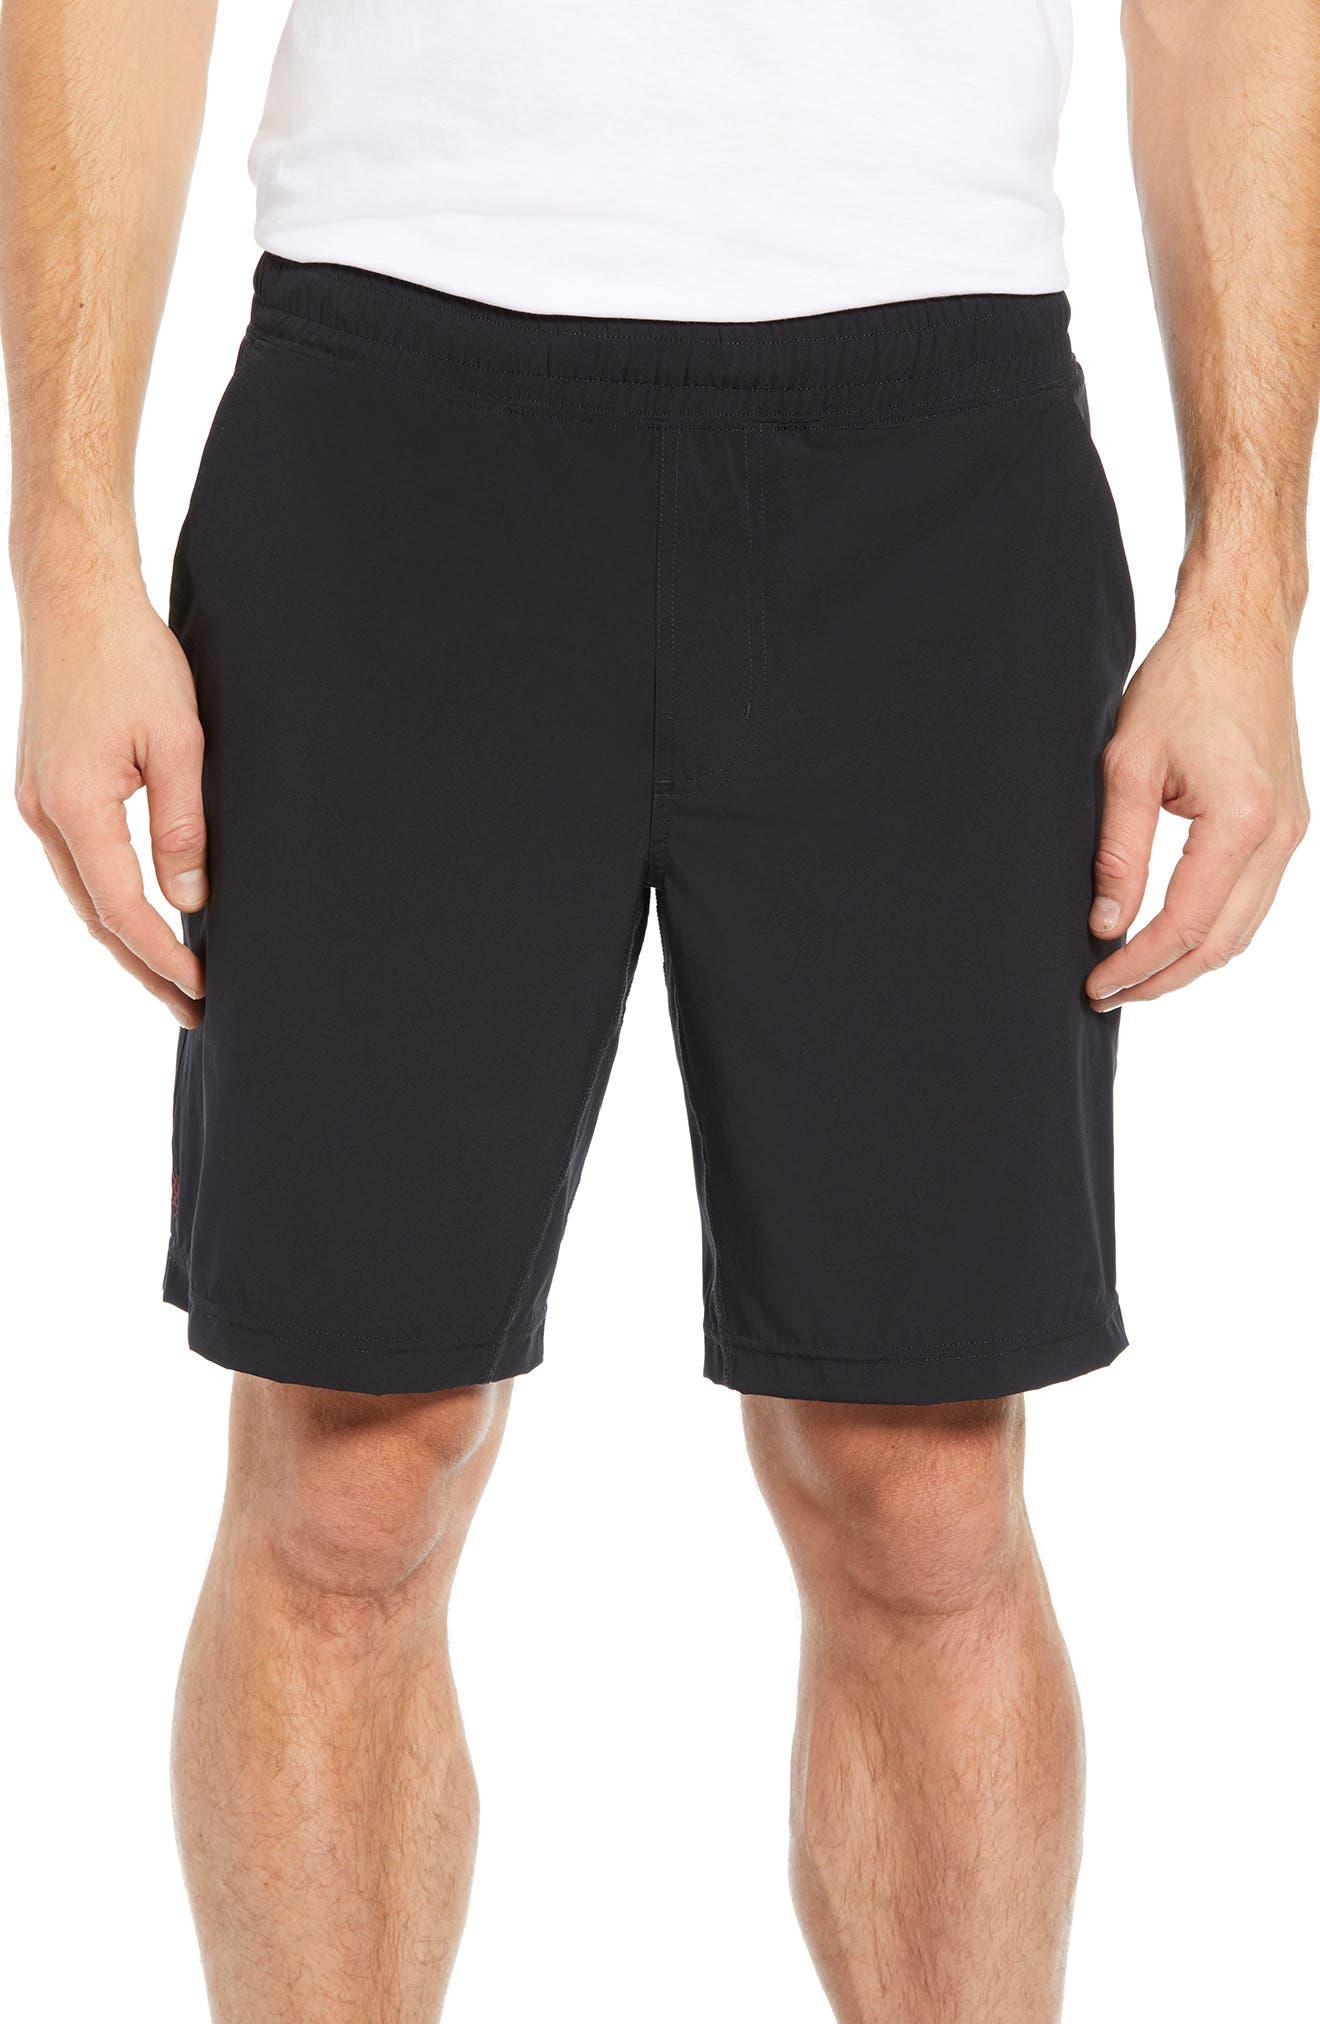 RHONE Mako Lined Shorts, Main, color, BLACK